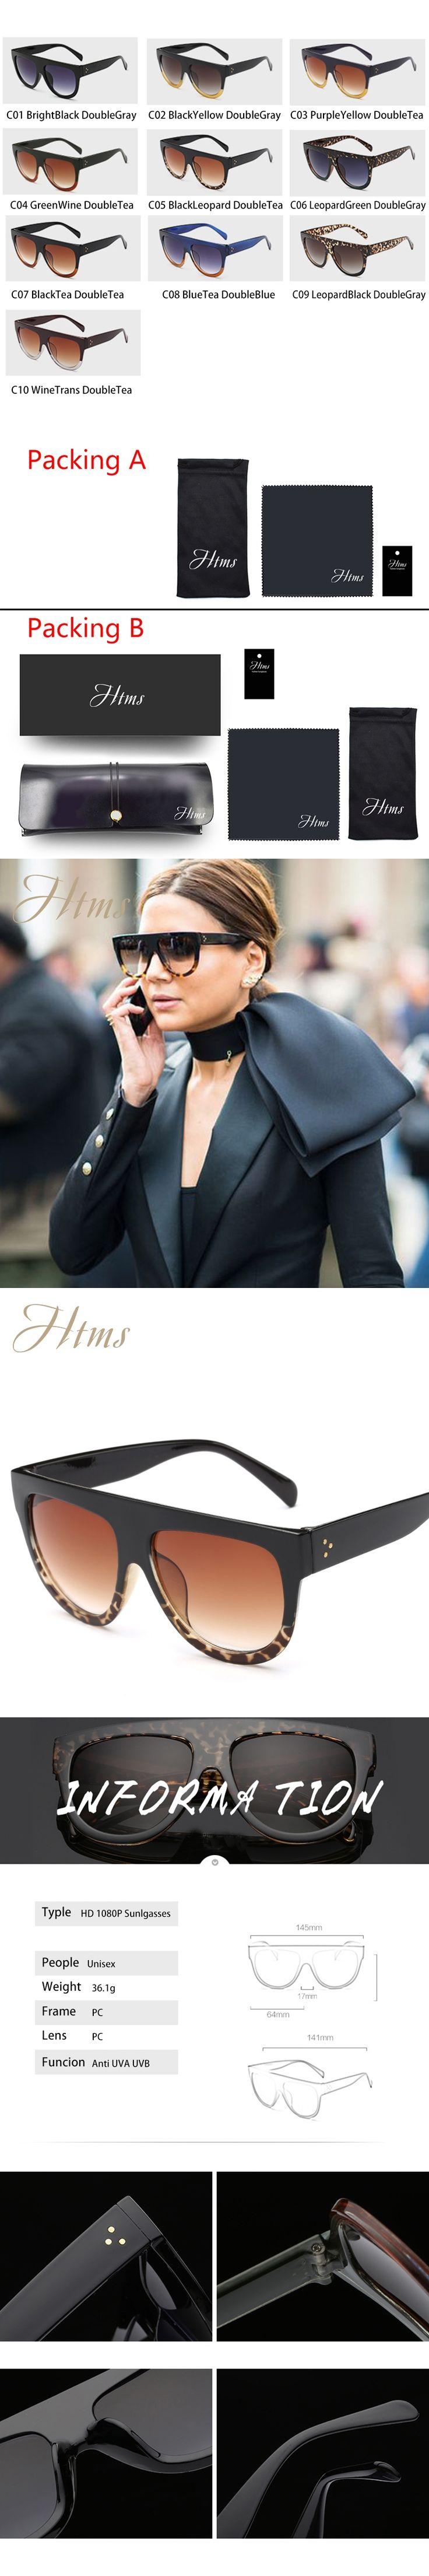 2017 Wild Fox Sunglasses Women Vintage Women Oculos Sol Feminino Ray Anti UVA UVB 10 Colors Big Frame UV400 Oversize Eyewear New